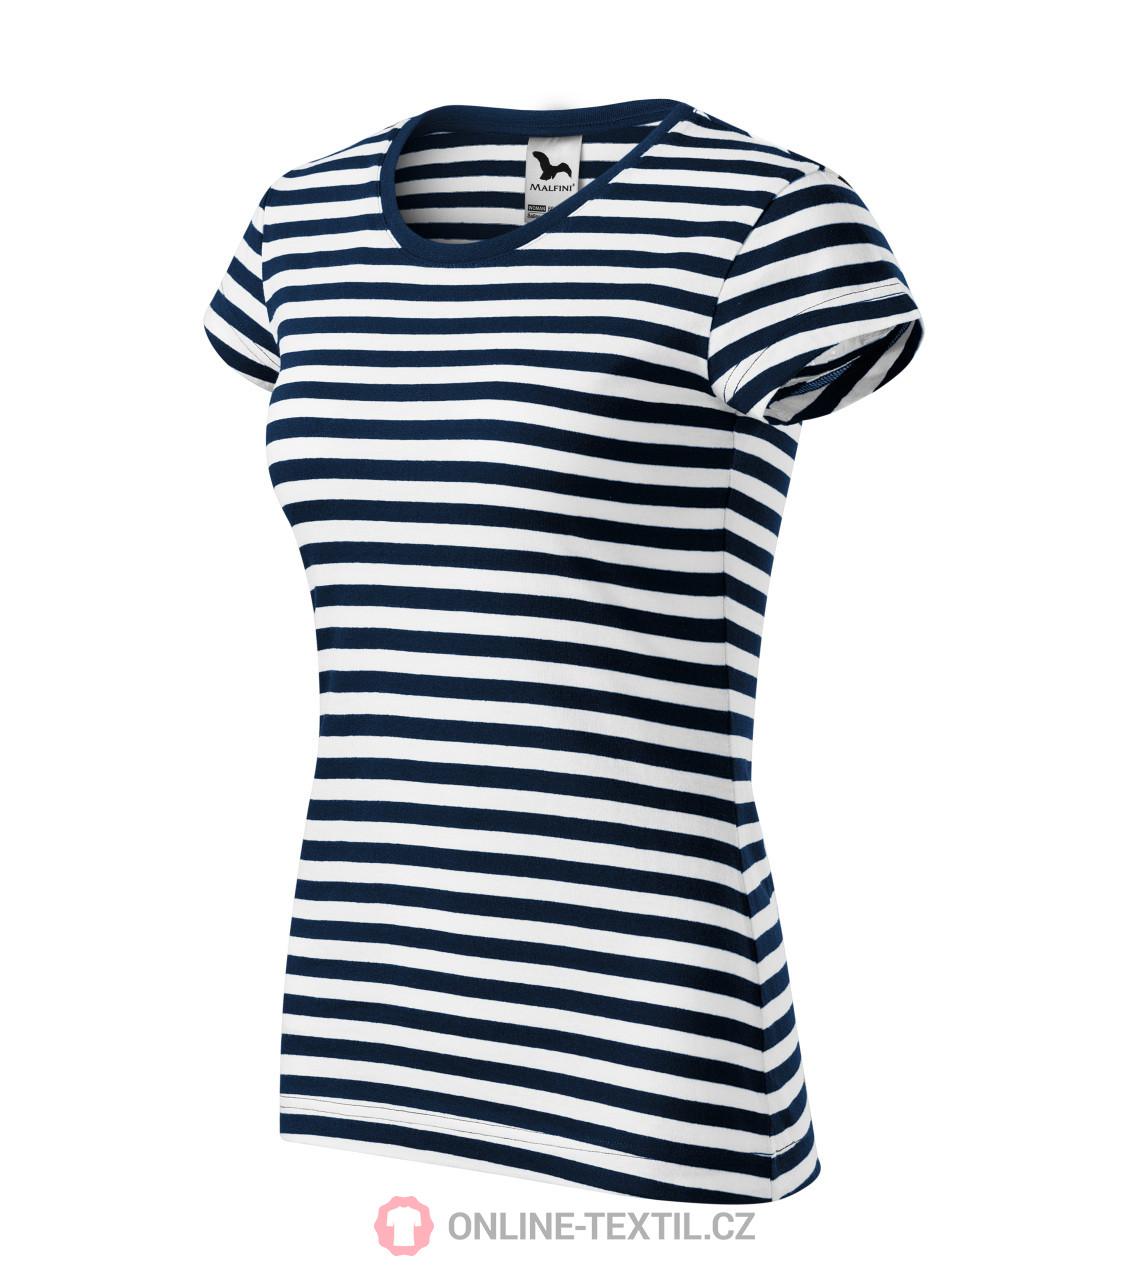 d045177a4 ADLER CZECH Sailor tričko dámske 804 - tmavomodrá z kolekcie MALFINI ...